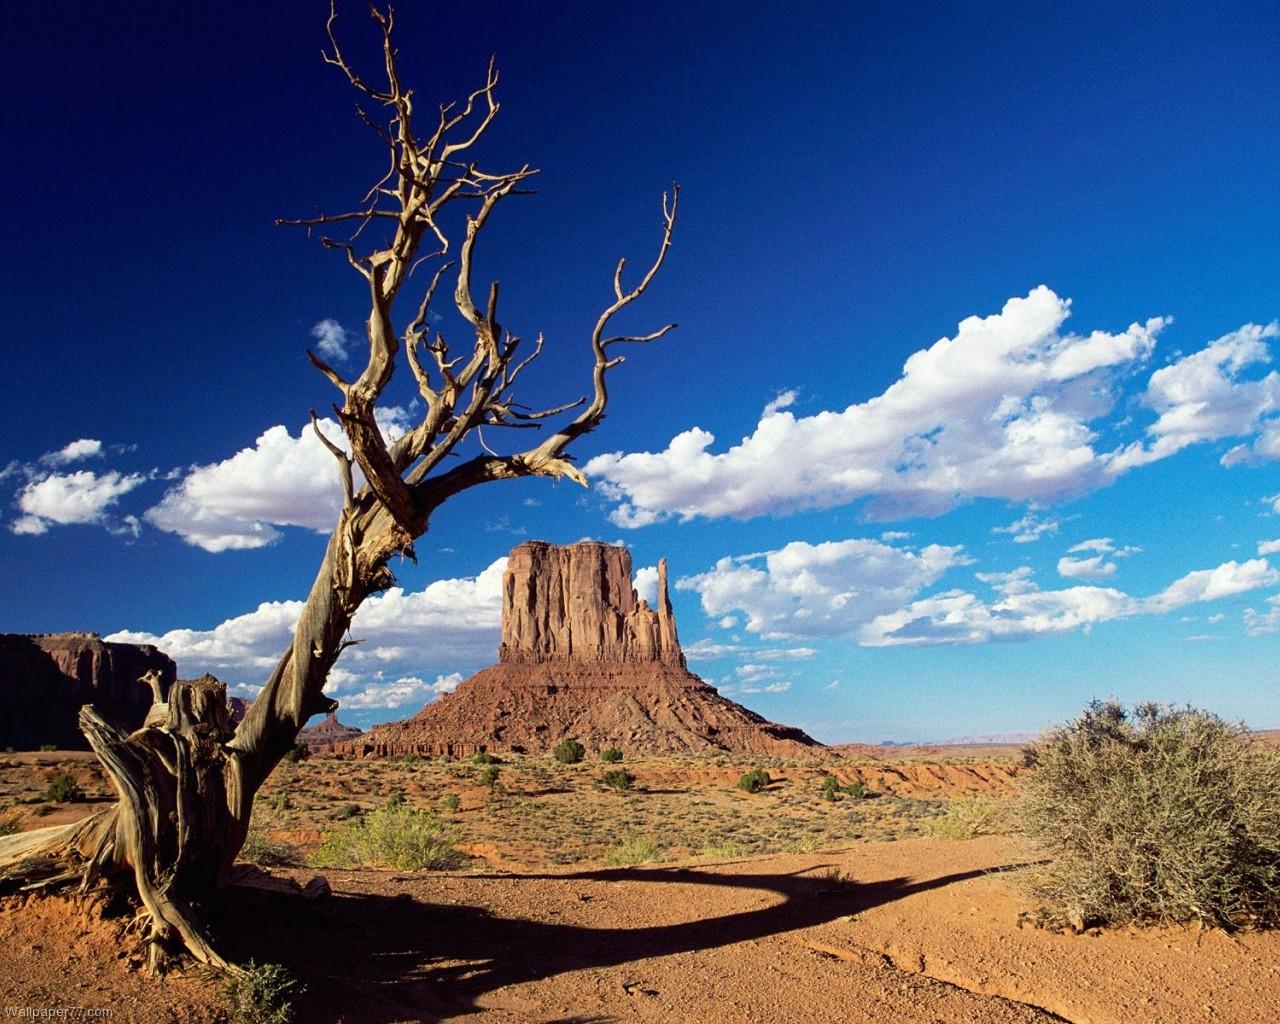 Western Tree 1280x1024 pixels Wallpapers tagged Landscape 1280x1024